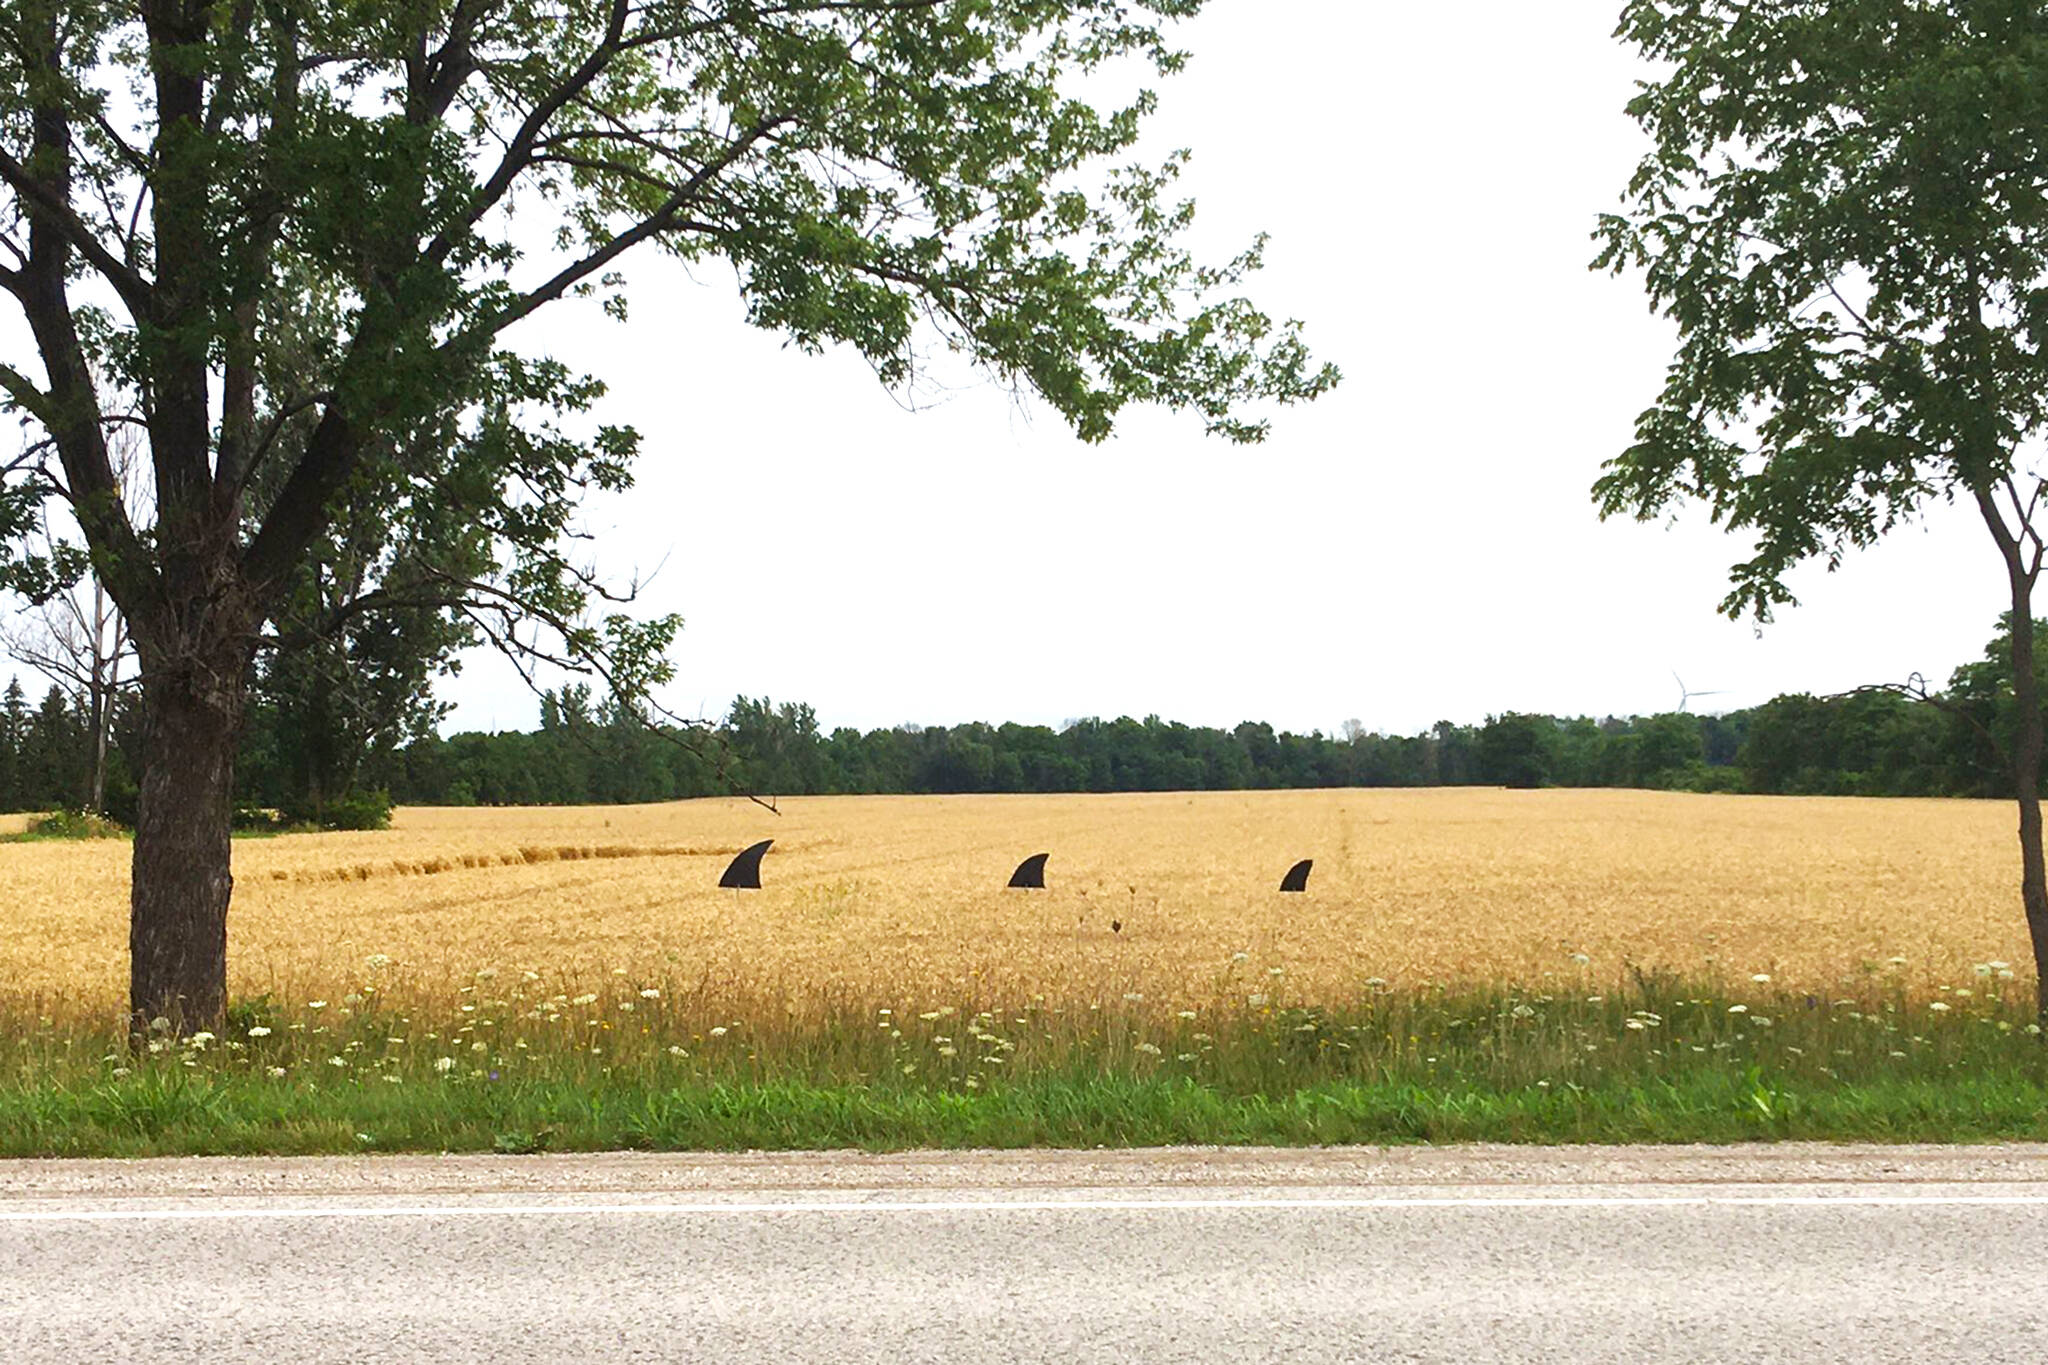 wheat fins